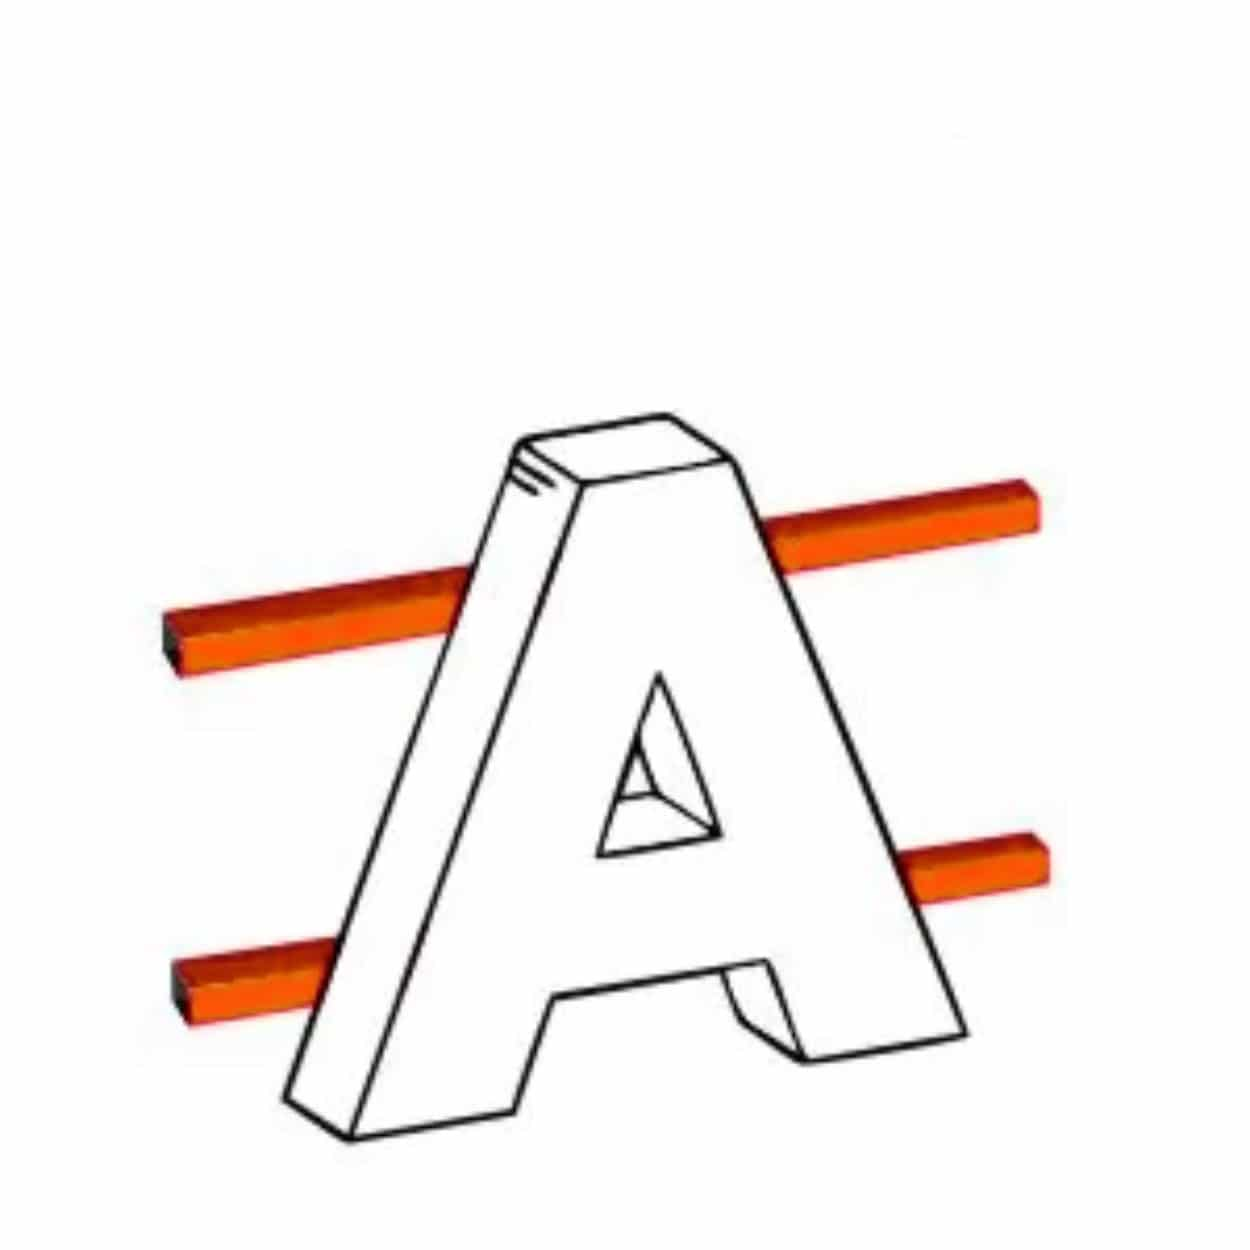 Объемные буквы на каркасе